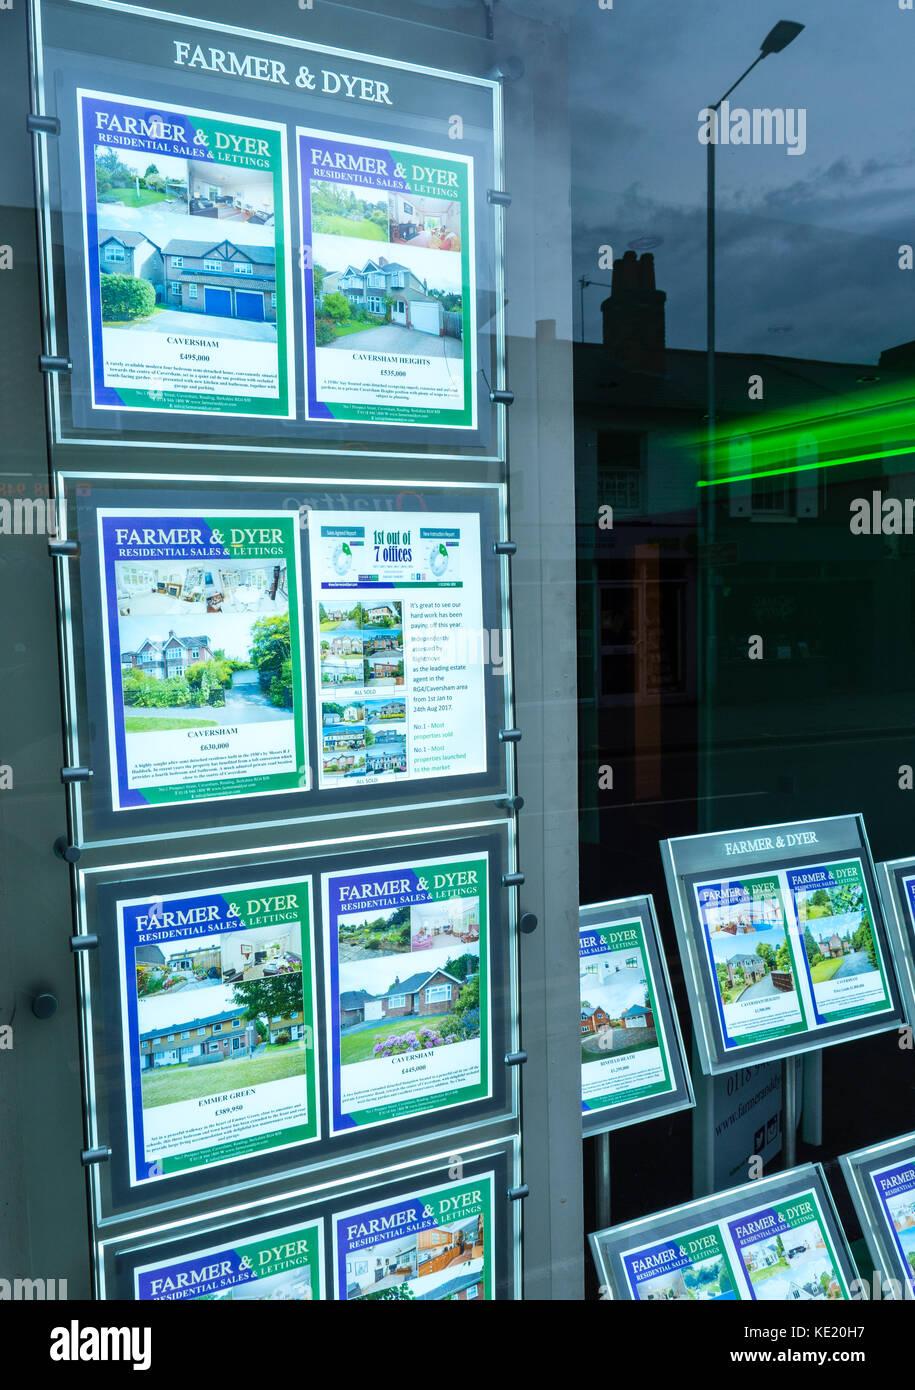 Farmer And Dyer Estate Agents, Caversham, Reading, Berkshire, England - Stock Image